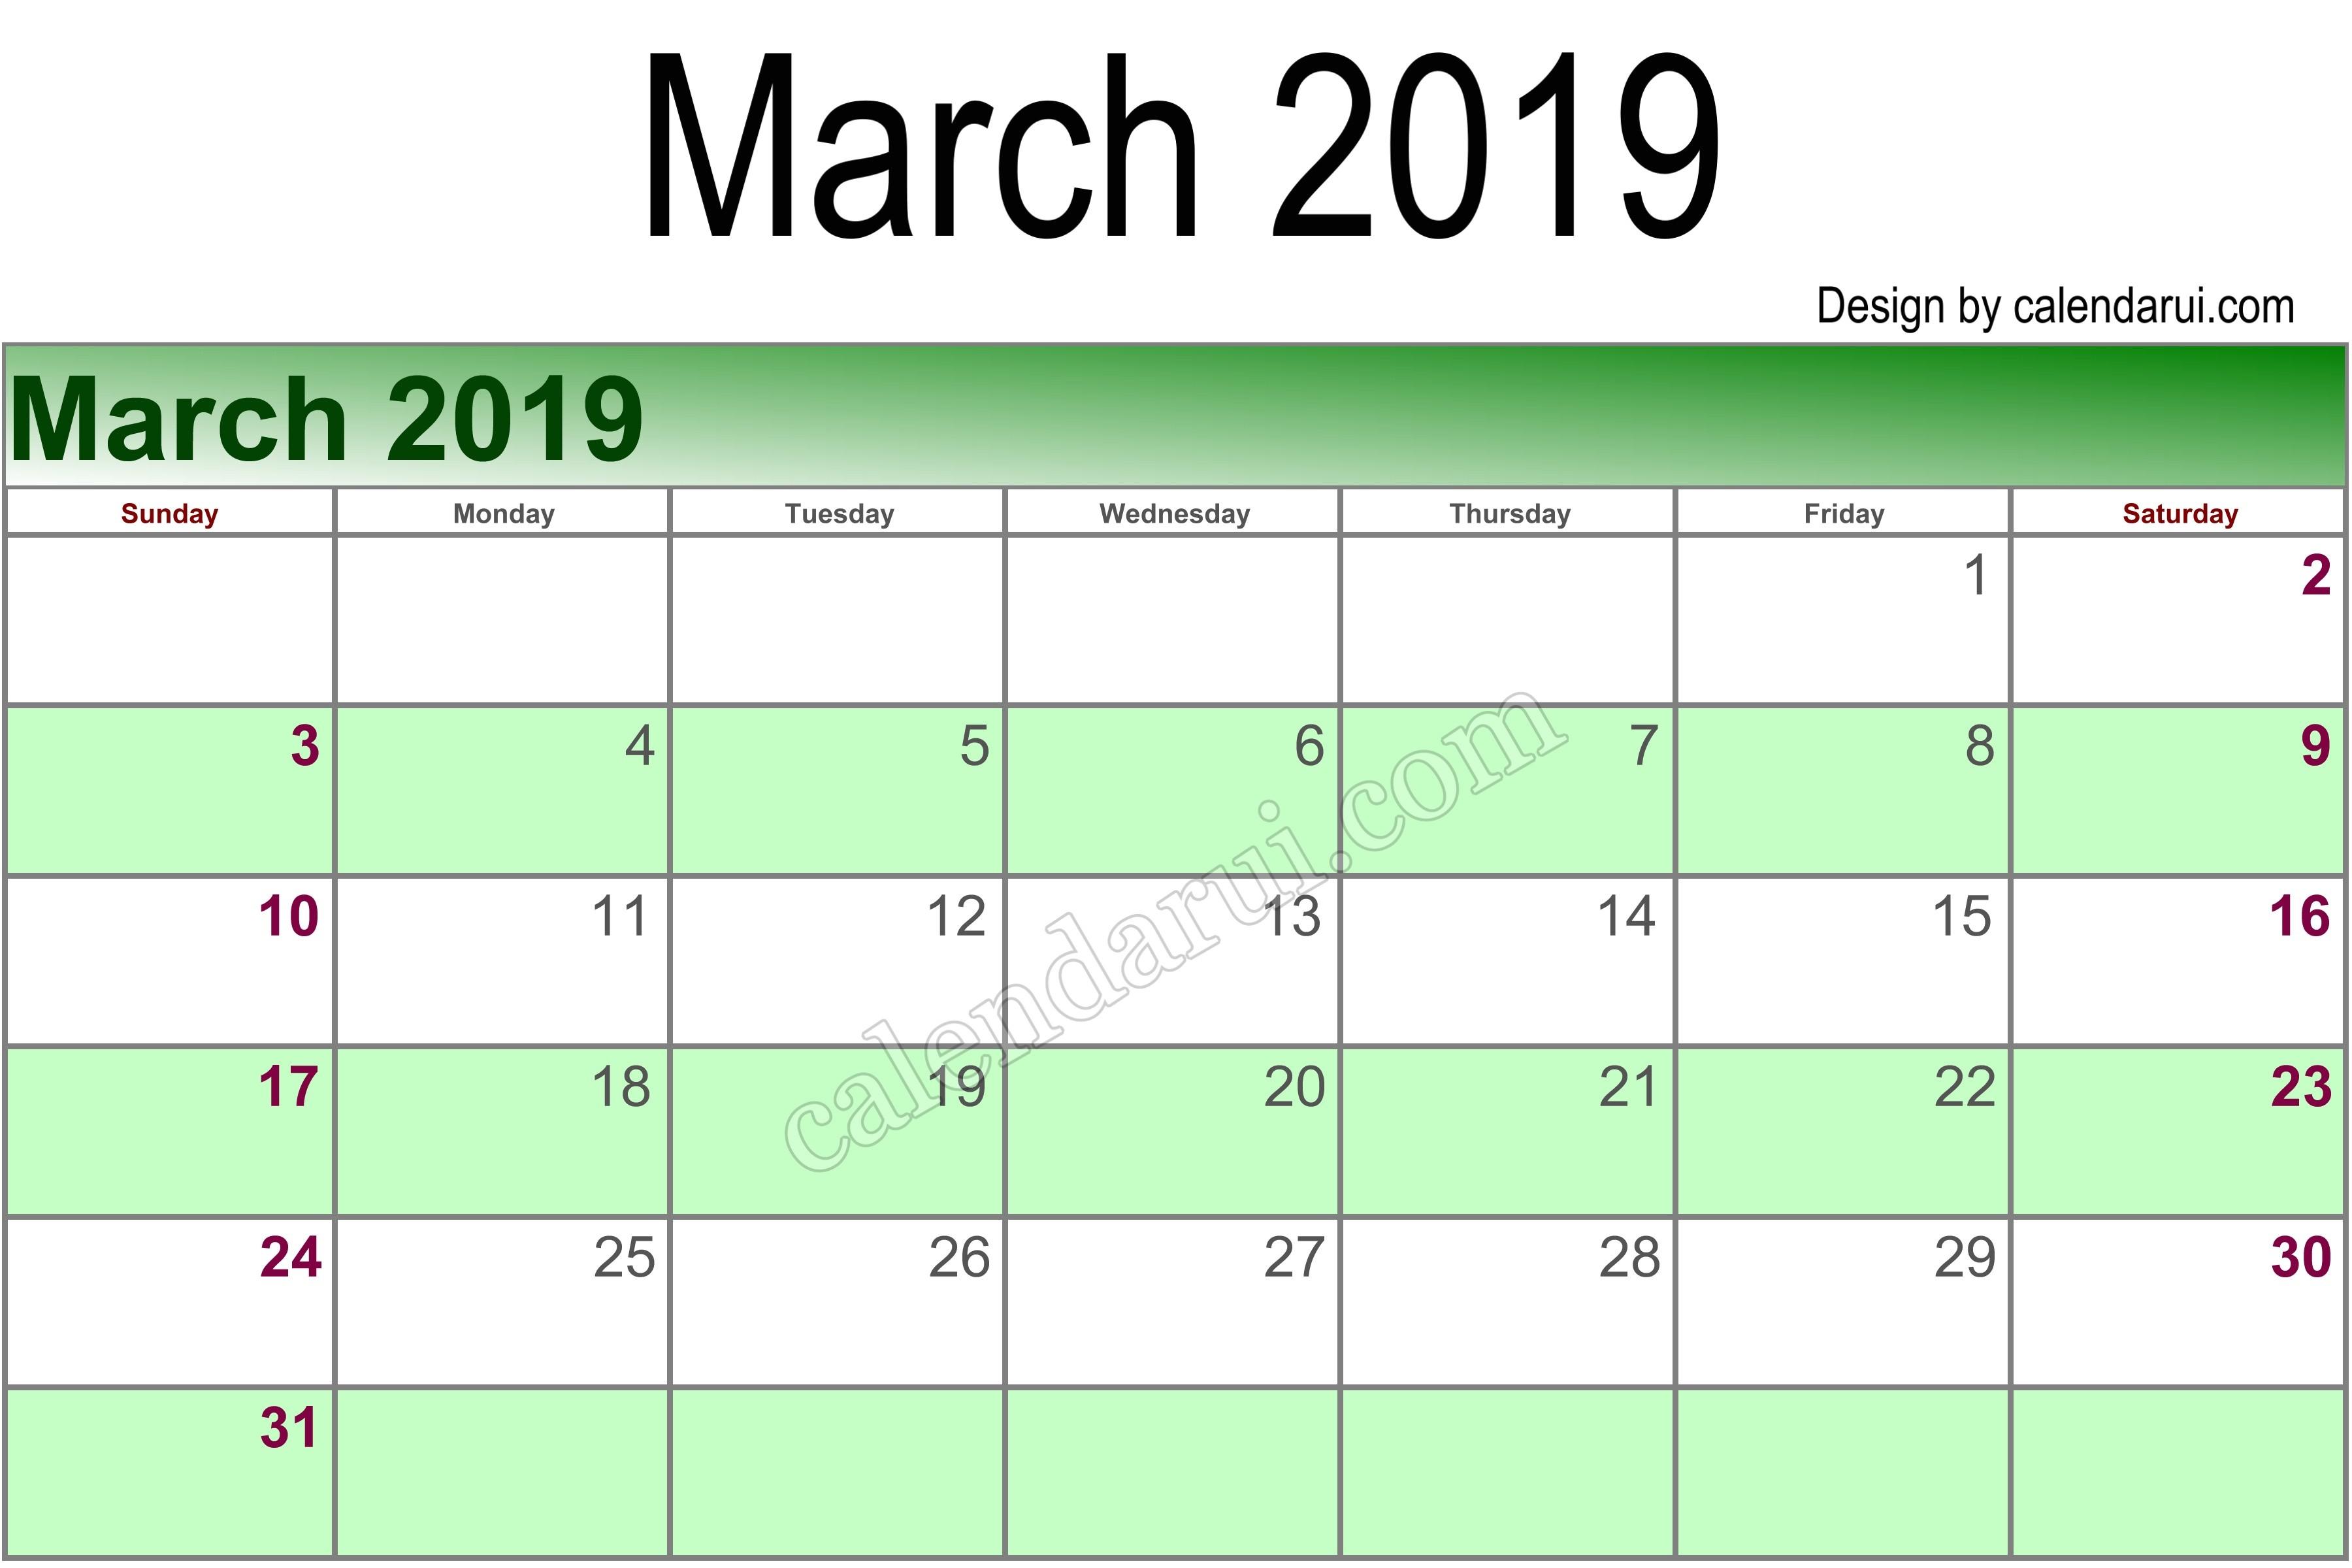 March Calendar 2019 Más Recientes Of March Calendar 2019 Template Rock Cafe Of March Calendar 2019 Actual Gujarati Calendar 2019 Printable Printed for No Cost – Calendaro